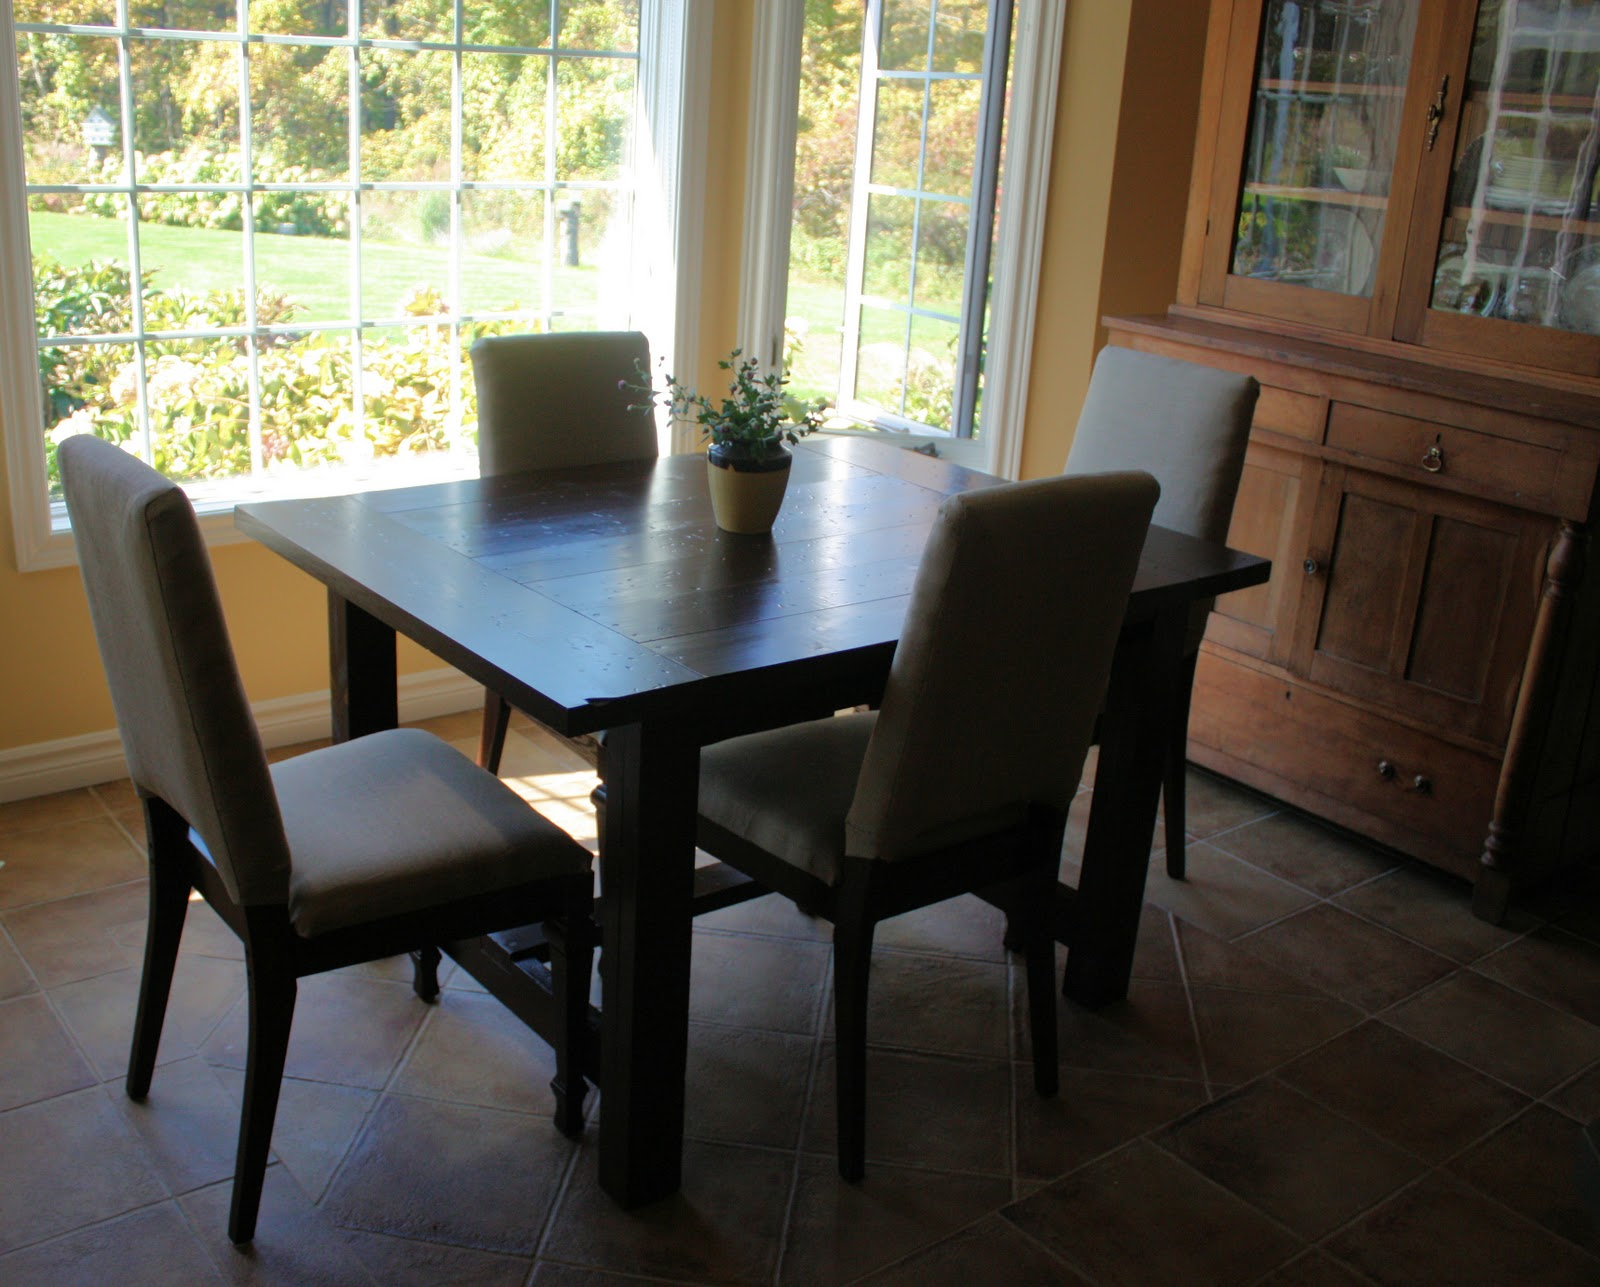 Landlocked: Farmhouse Kitchen Table